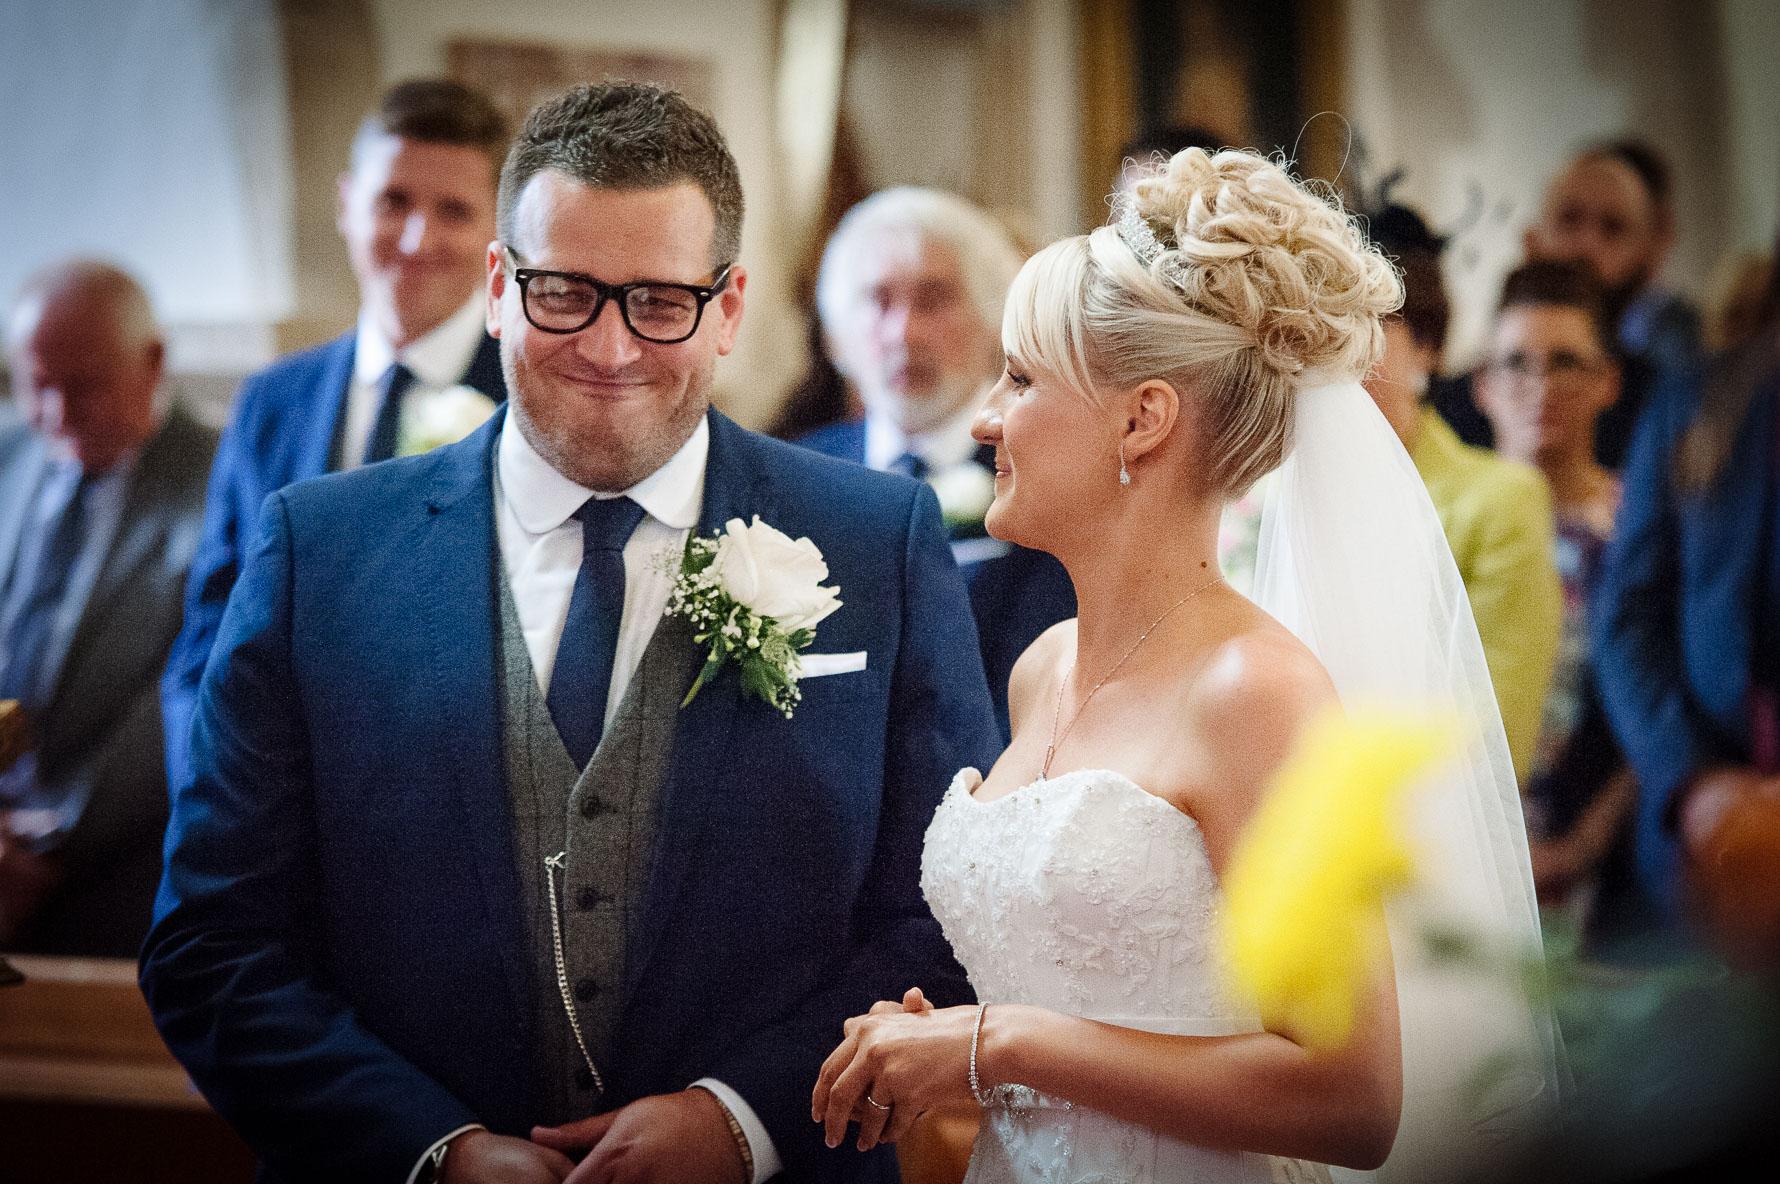 Canterbury Cathedral Lodge Wedding27-20141004 0466